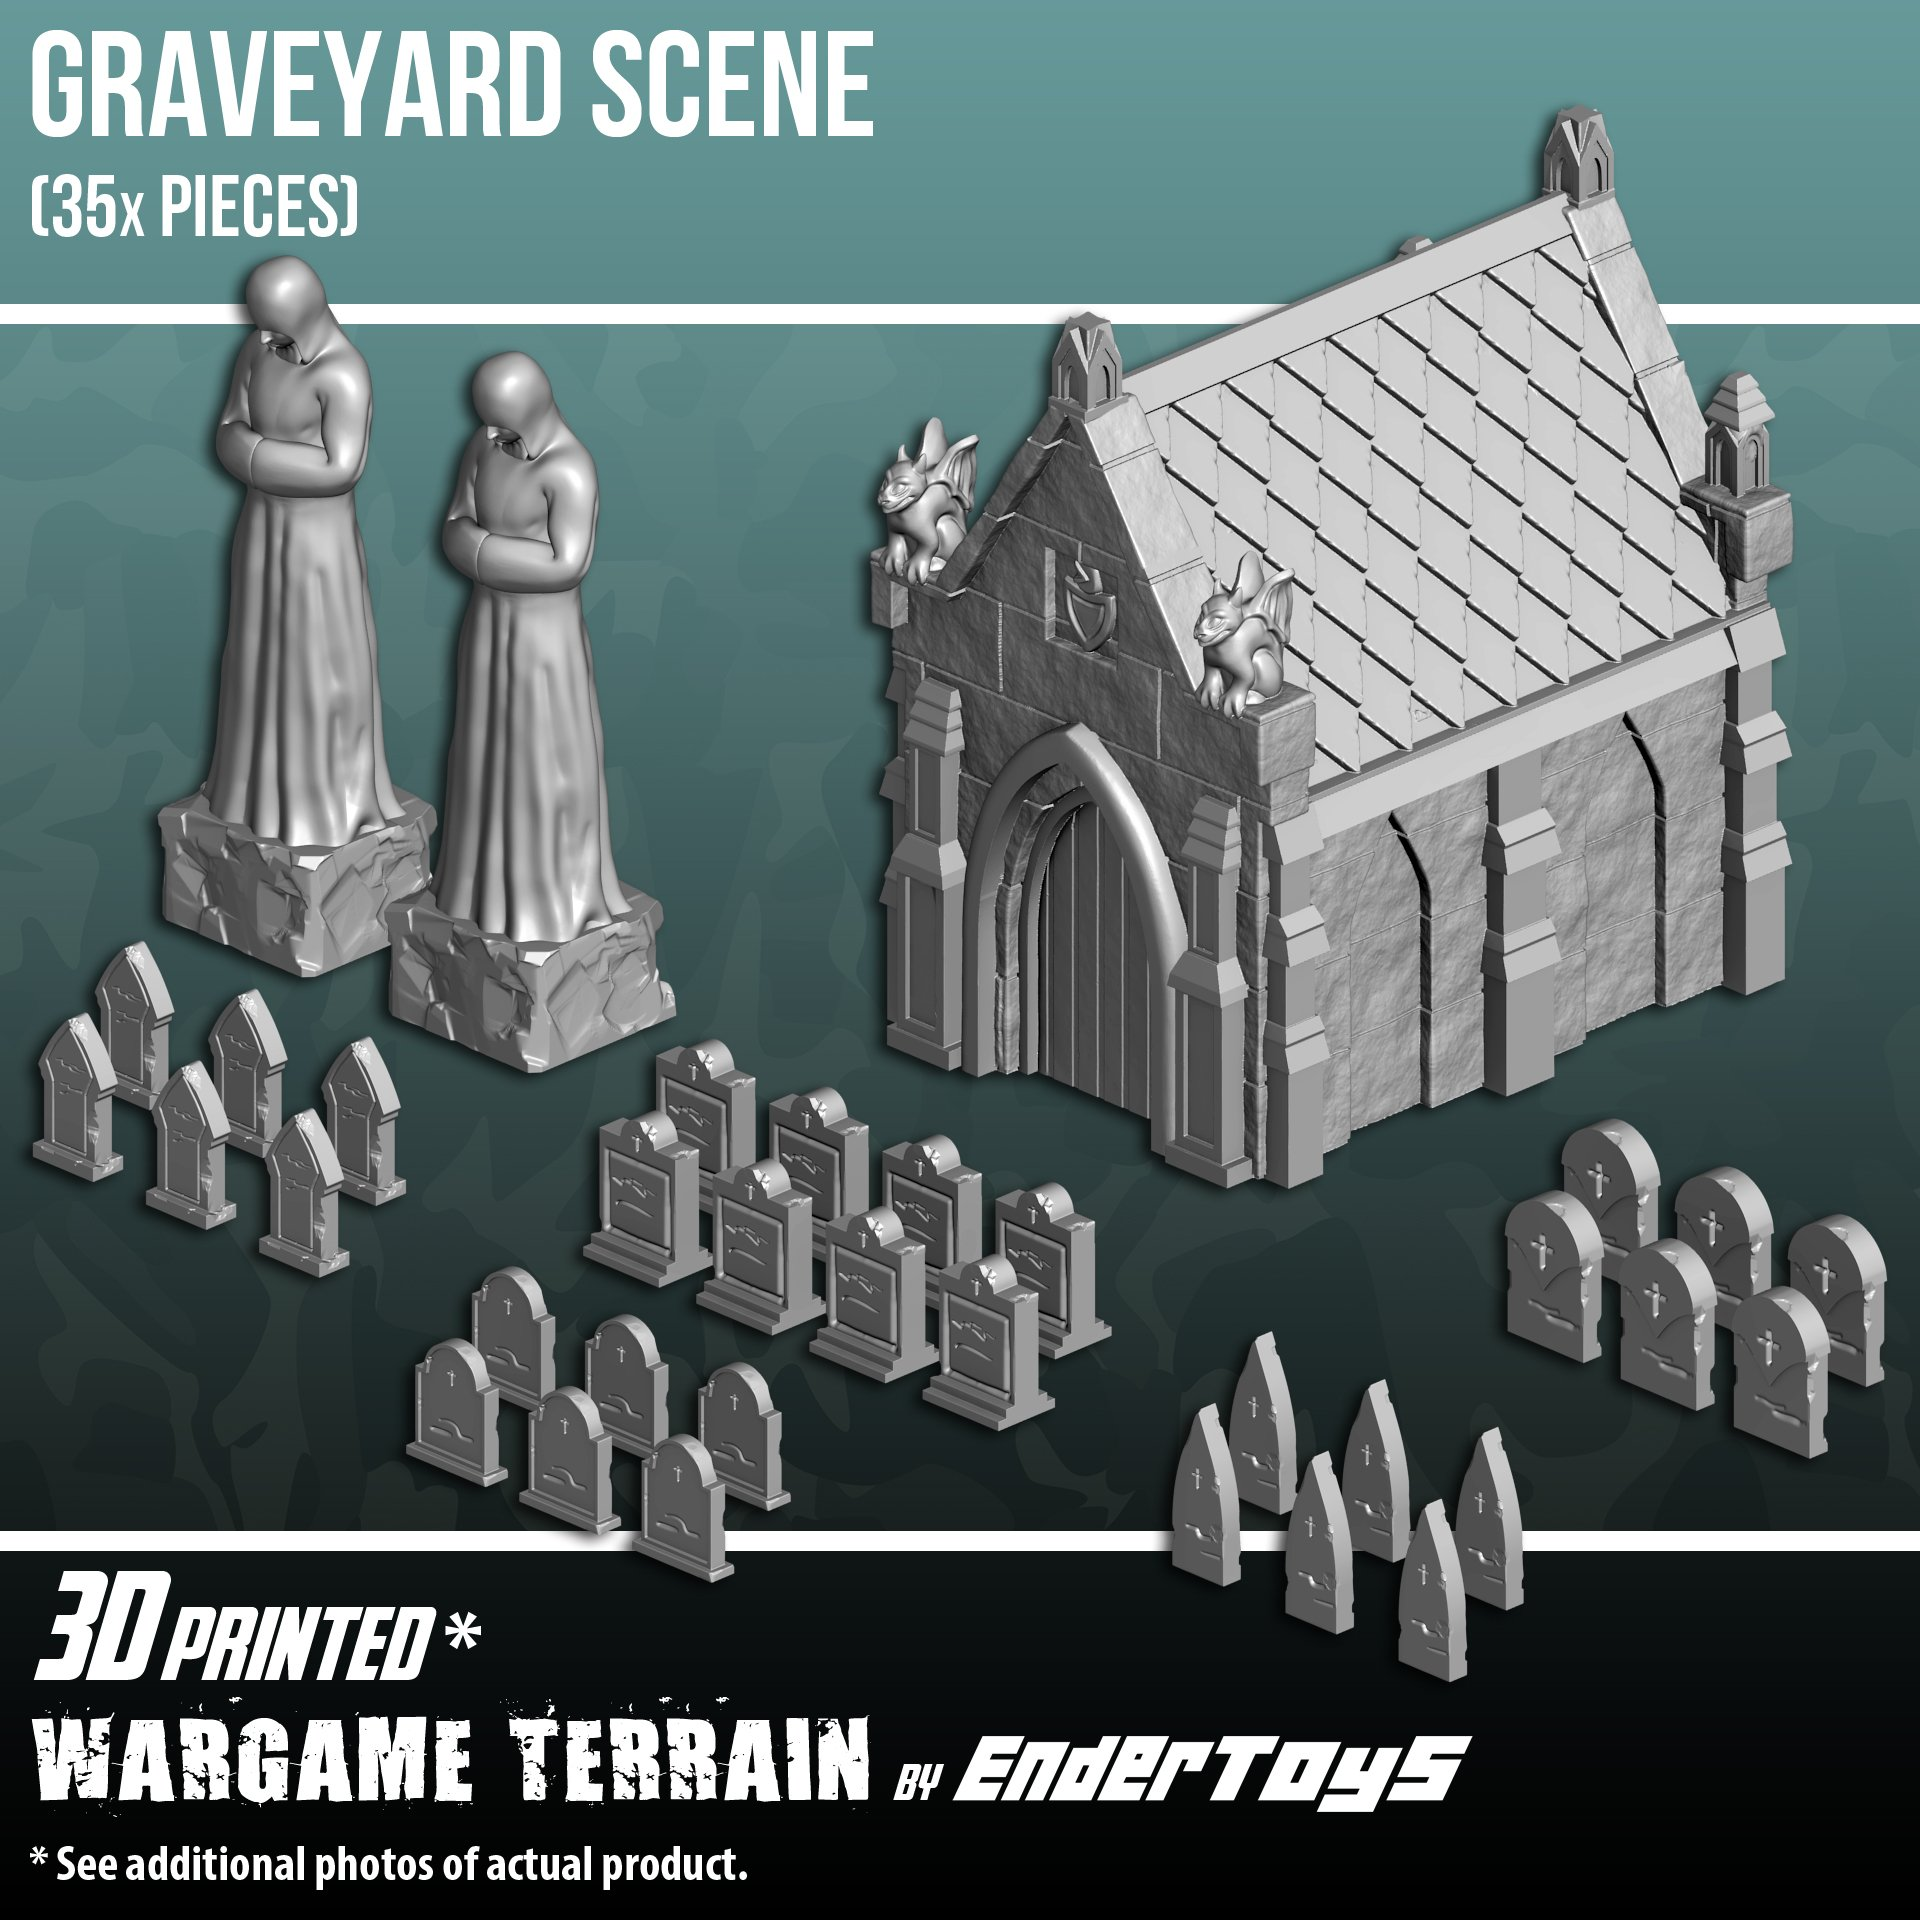 EnderToys Mausoleum Graveyard Scene, Terrain Scenery for Tabletop 28mm Miniatures Wargame, 3D Printed and Paintable